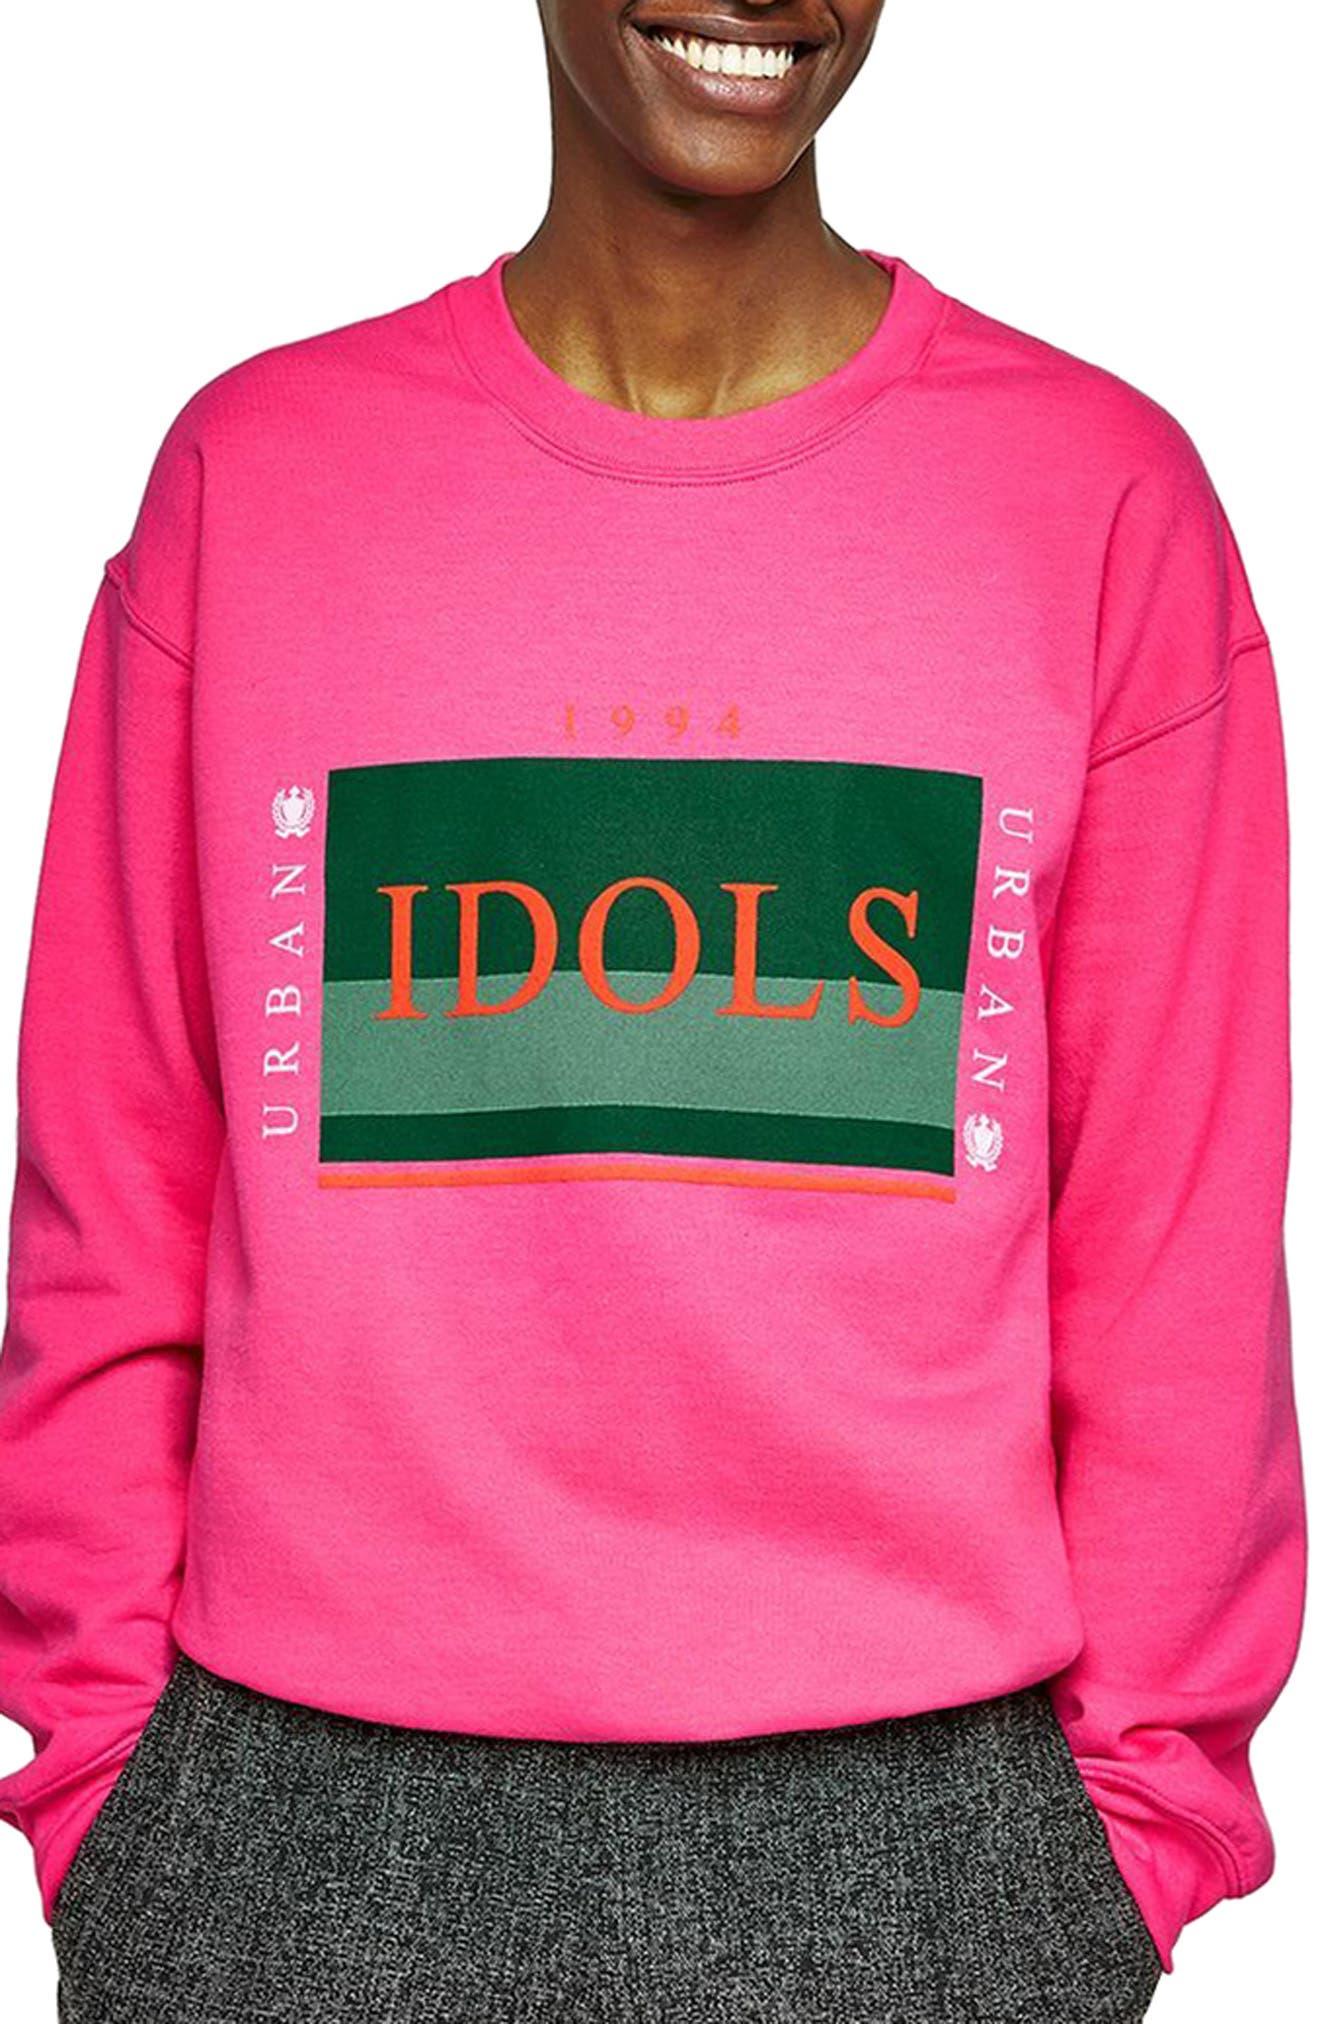 Urban Idols Graphic Sweatshirt,                             Main thumbnail 1, color,                             650